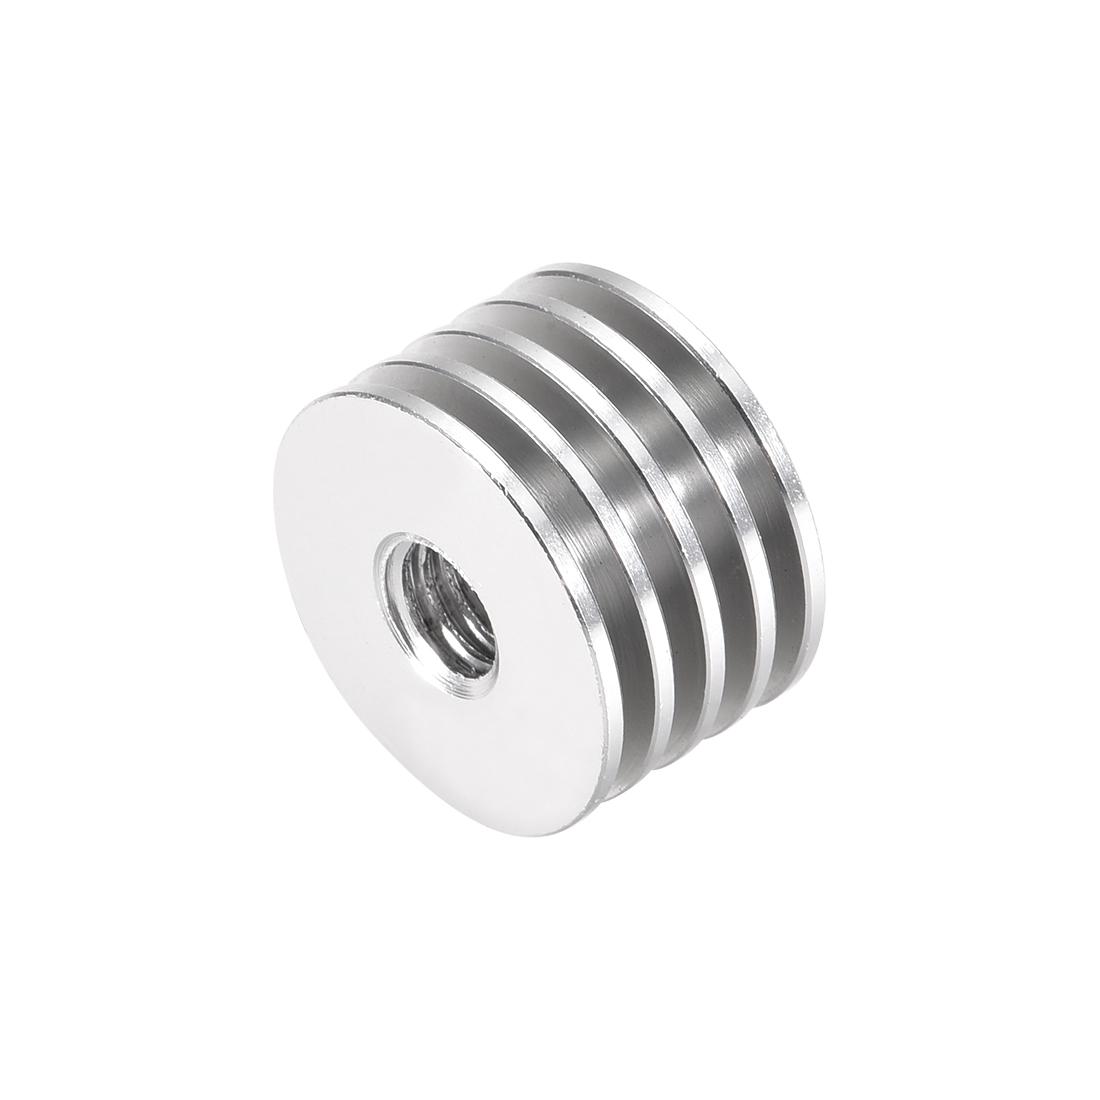 Heatsink for 3D Printer Heat Sink, Fit for 3D Reprap J-head Extruder M6 Pipe